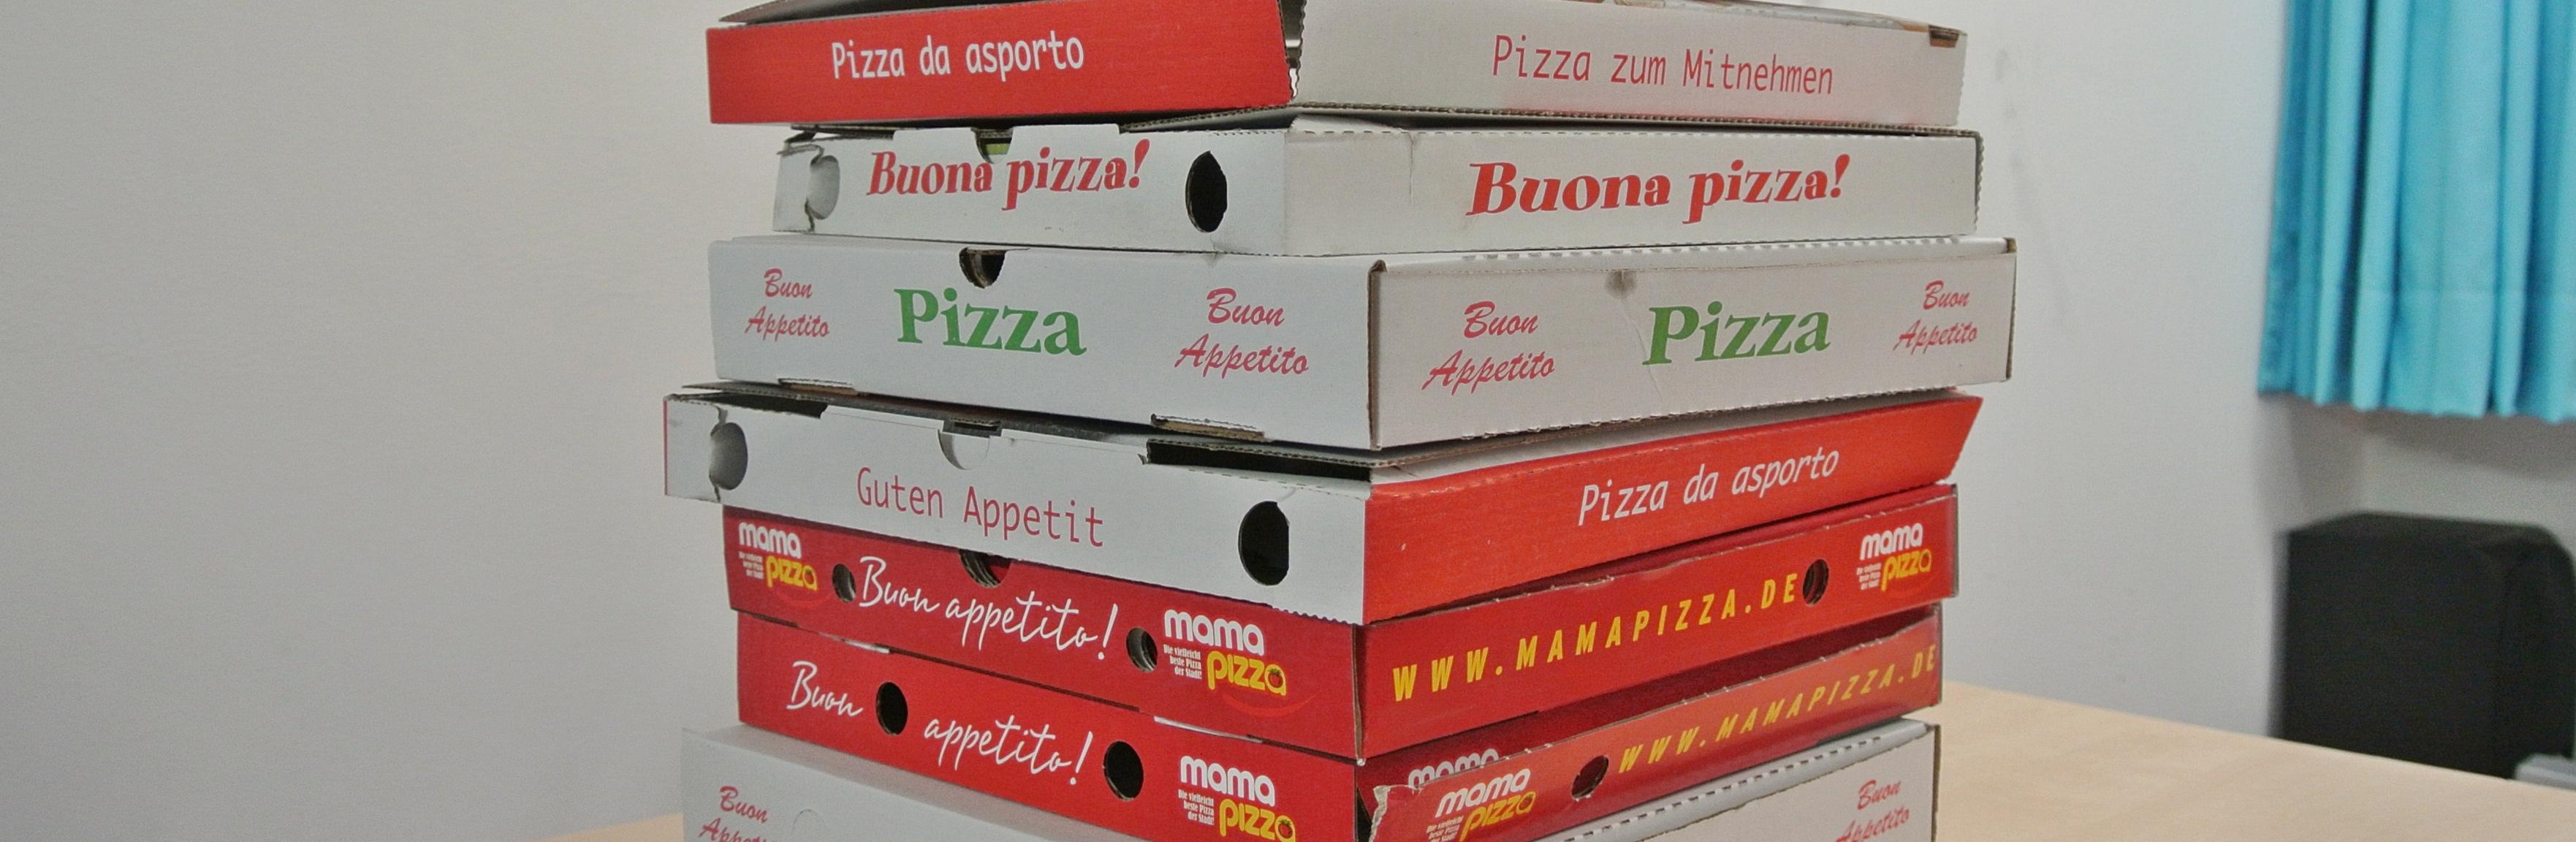 KULT testet: Pizza-Lieferdienste